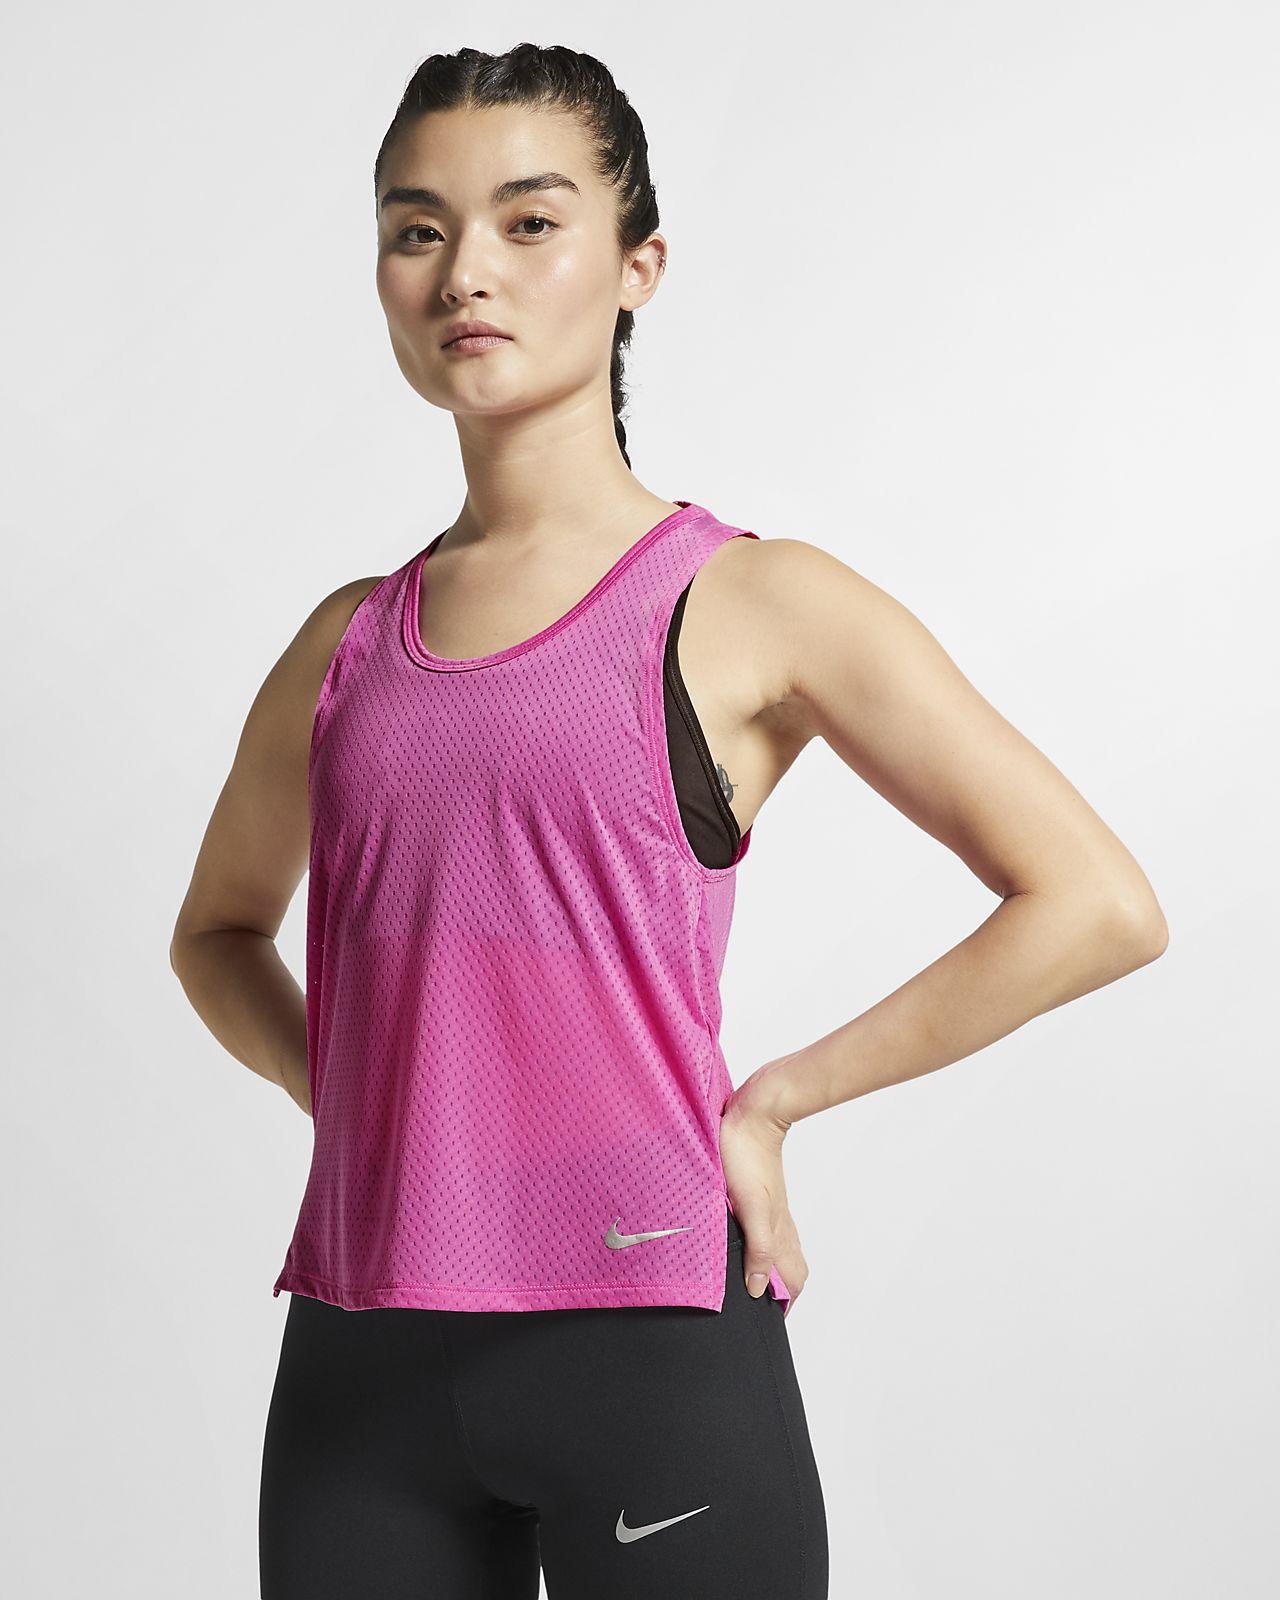 a1b787dc85a85 Nike Breathe Miler Women s Running Tank. Nike.com